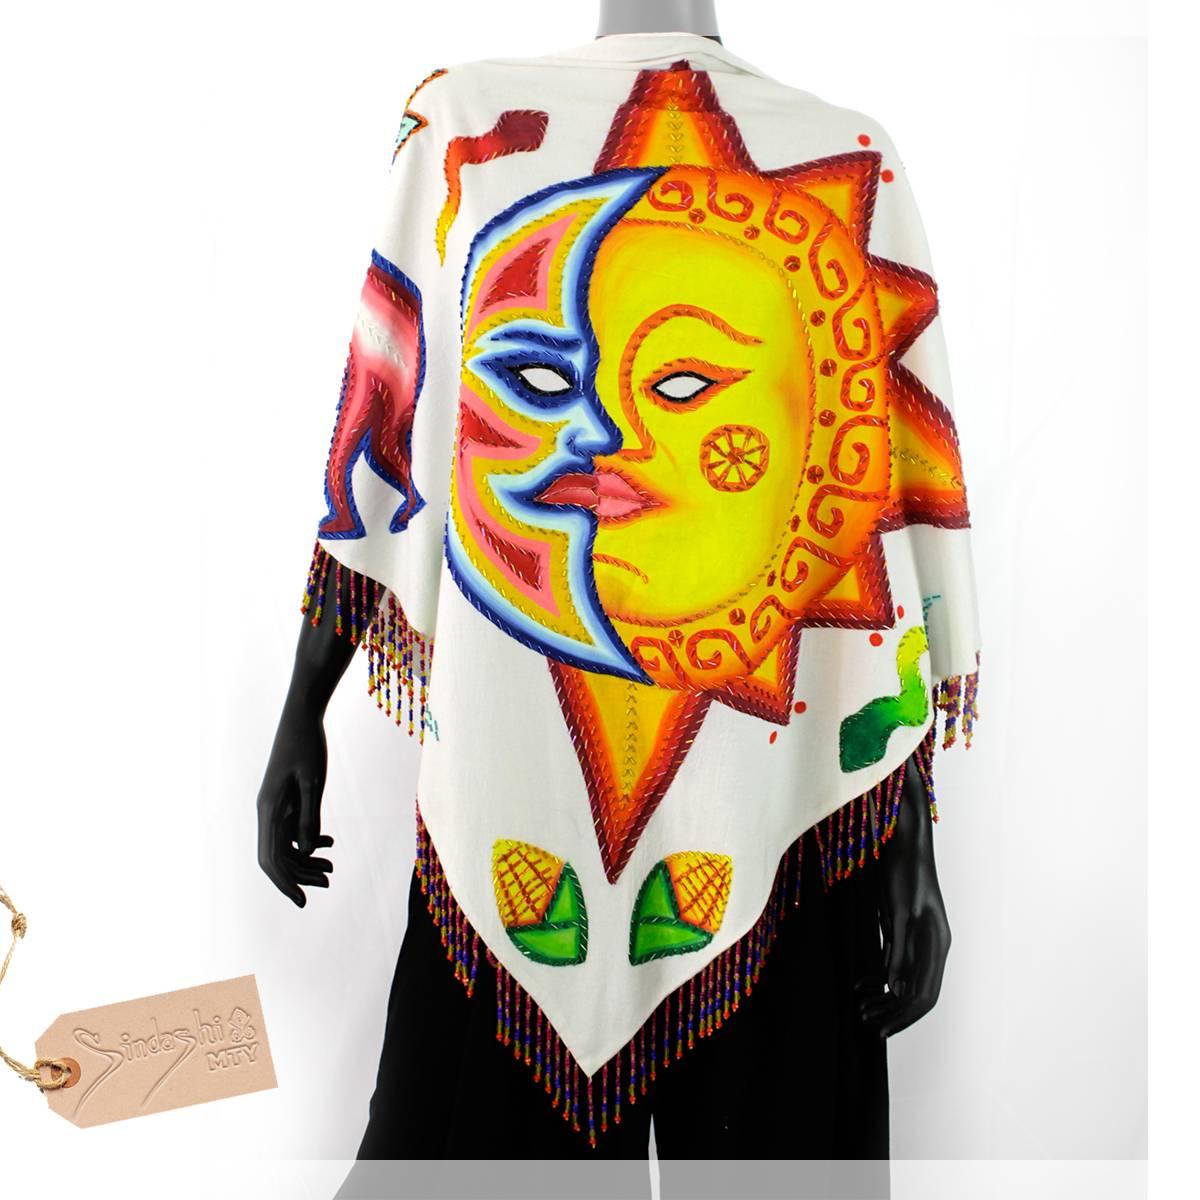 3a57cc0214  artesaniamexicana  artfashion  mujeresmty  modaartesanal  artemoda   mexicocolors  42kartemexicano  ropademoda   SindashiMTYpic.twitter.com WRZ7p13o0O